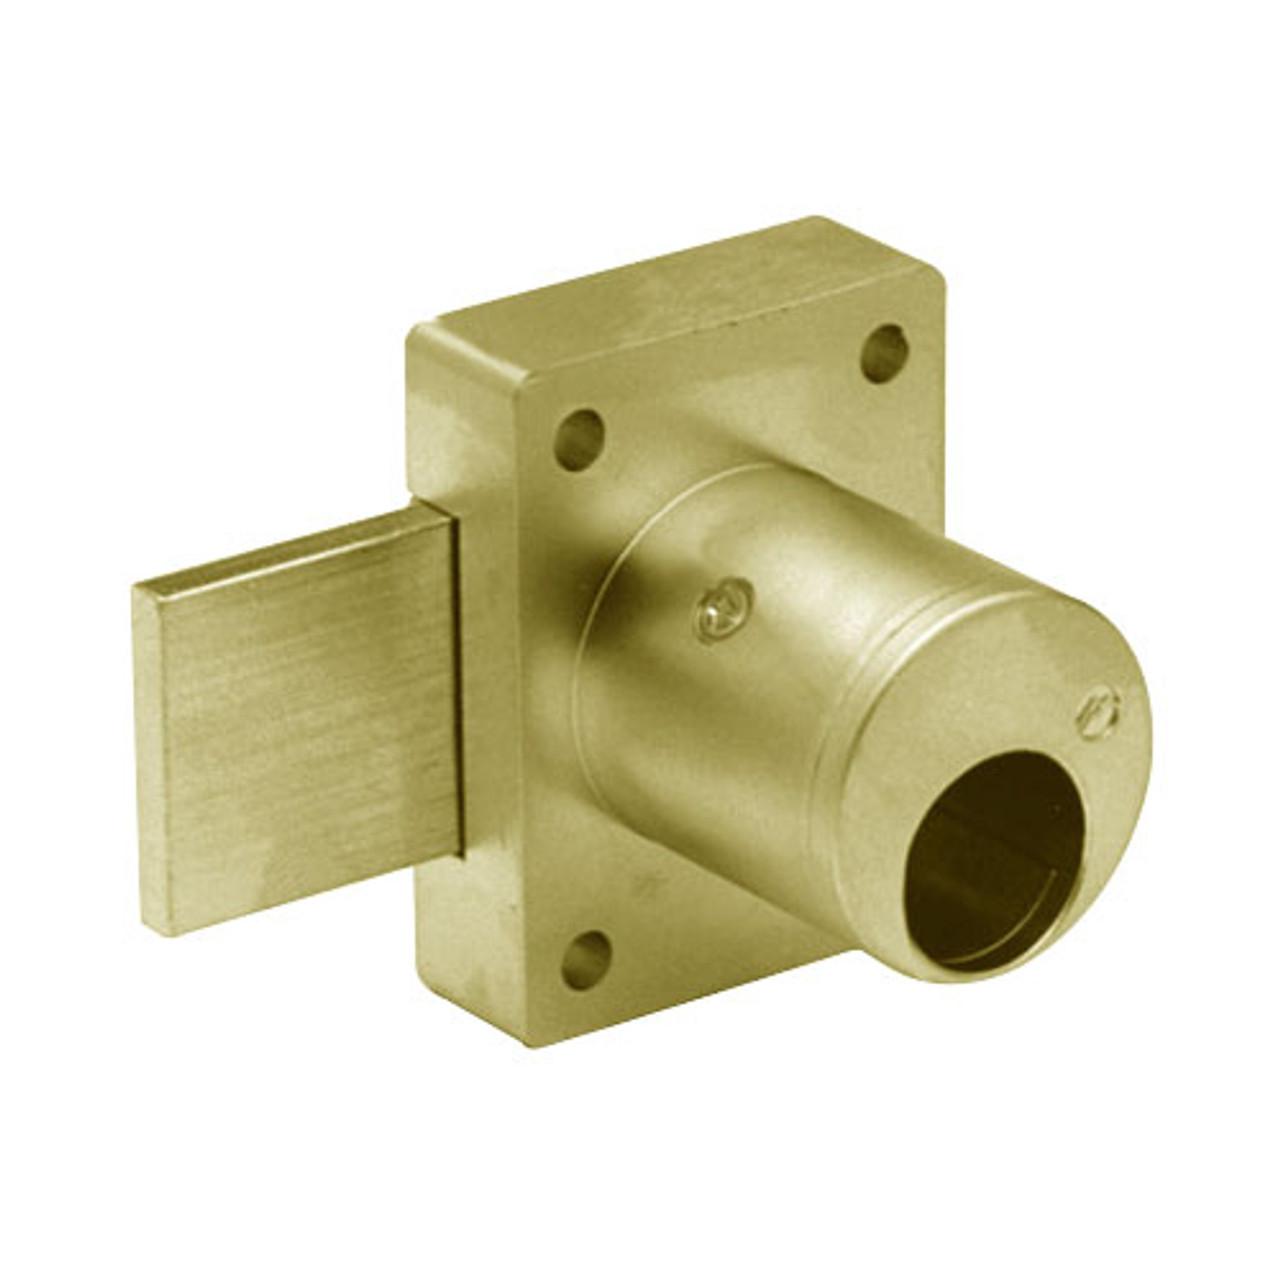 Olympus 700LCM-US3-1-3/8 Cabinet Door Locks in Bright Brass Finish